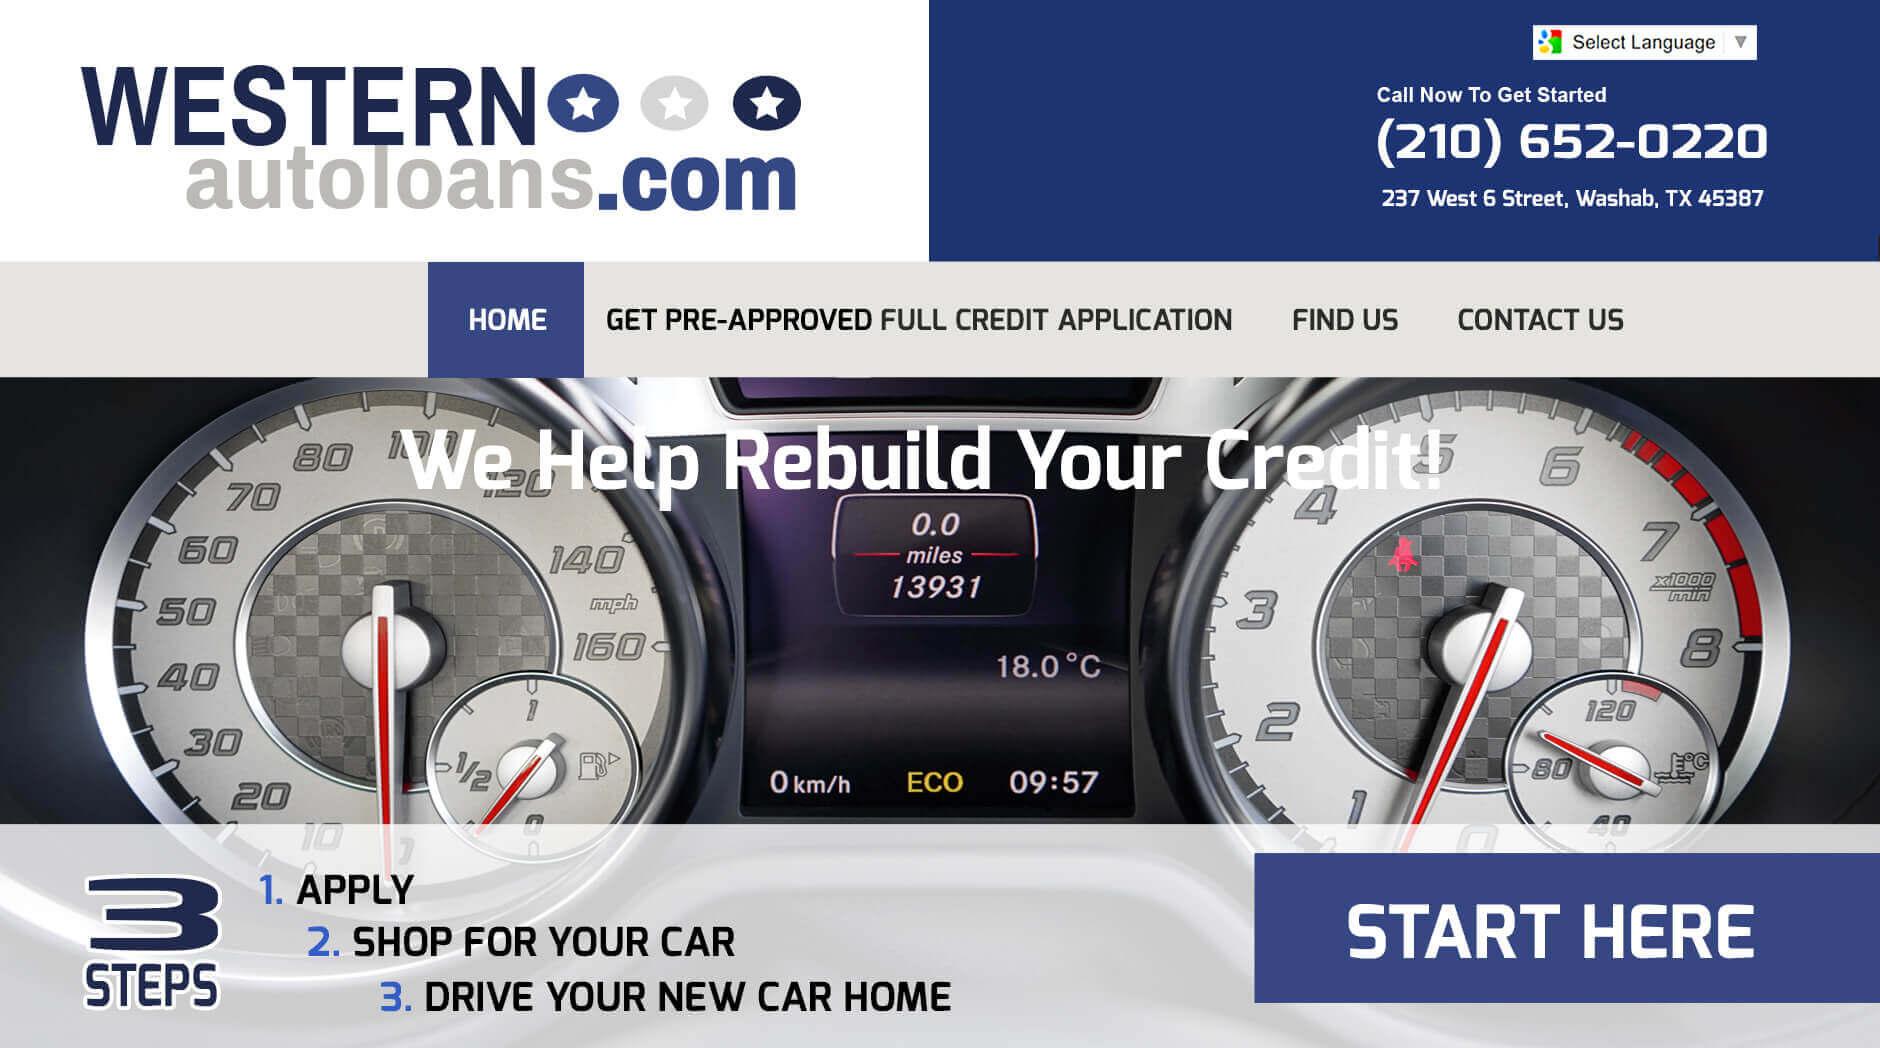 Western Auto Loans Re-Design 1 Western Auto Loans Re-Design